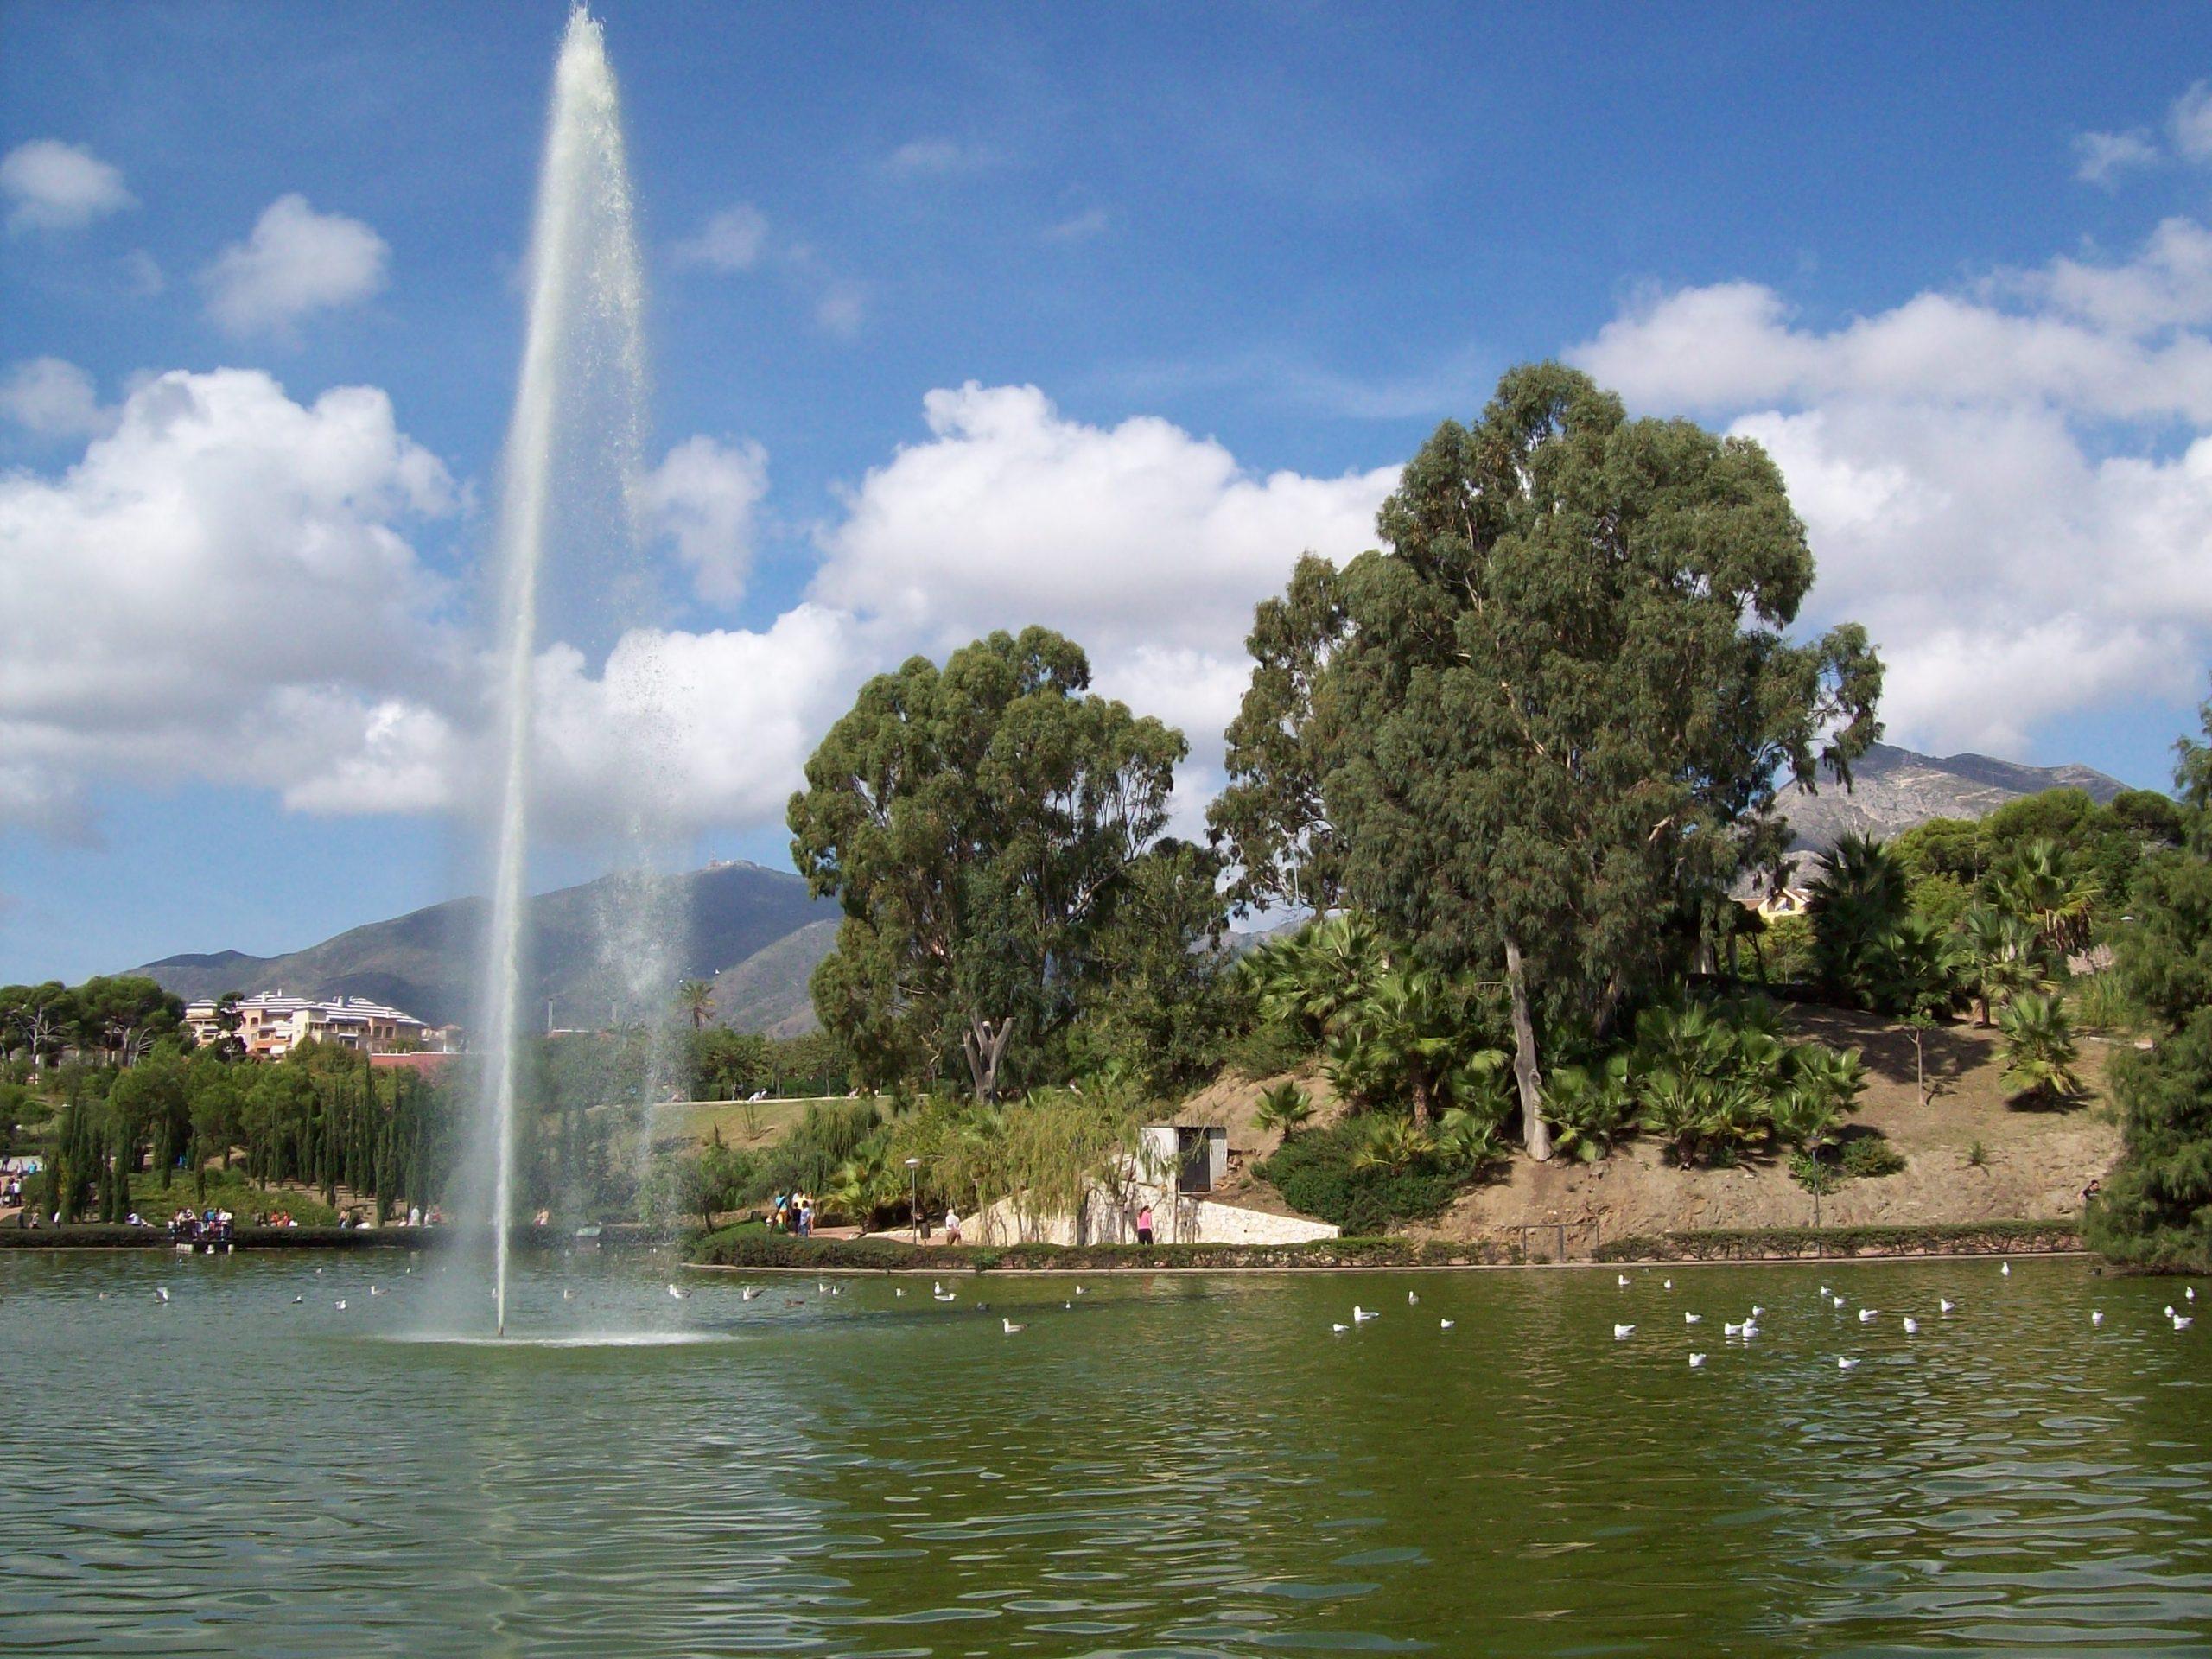 Parque de la Paloma, Benalmádena.